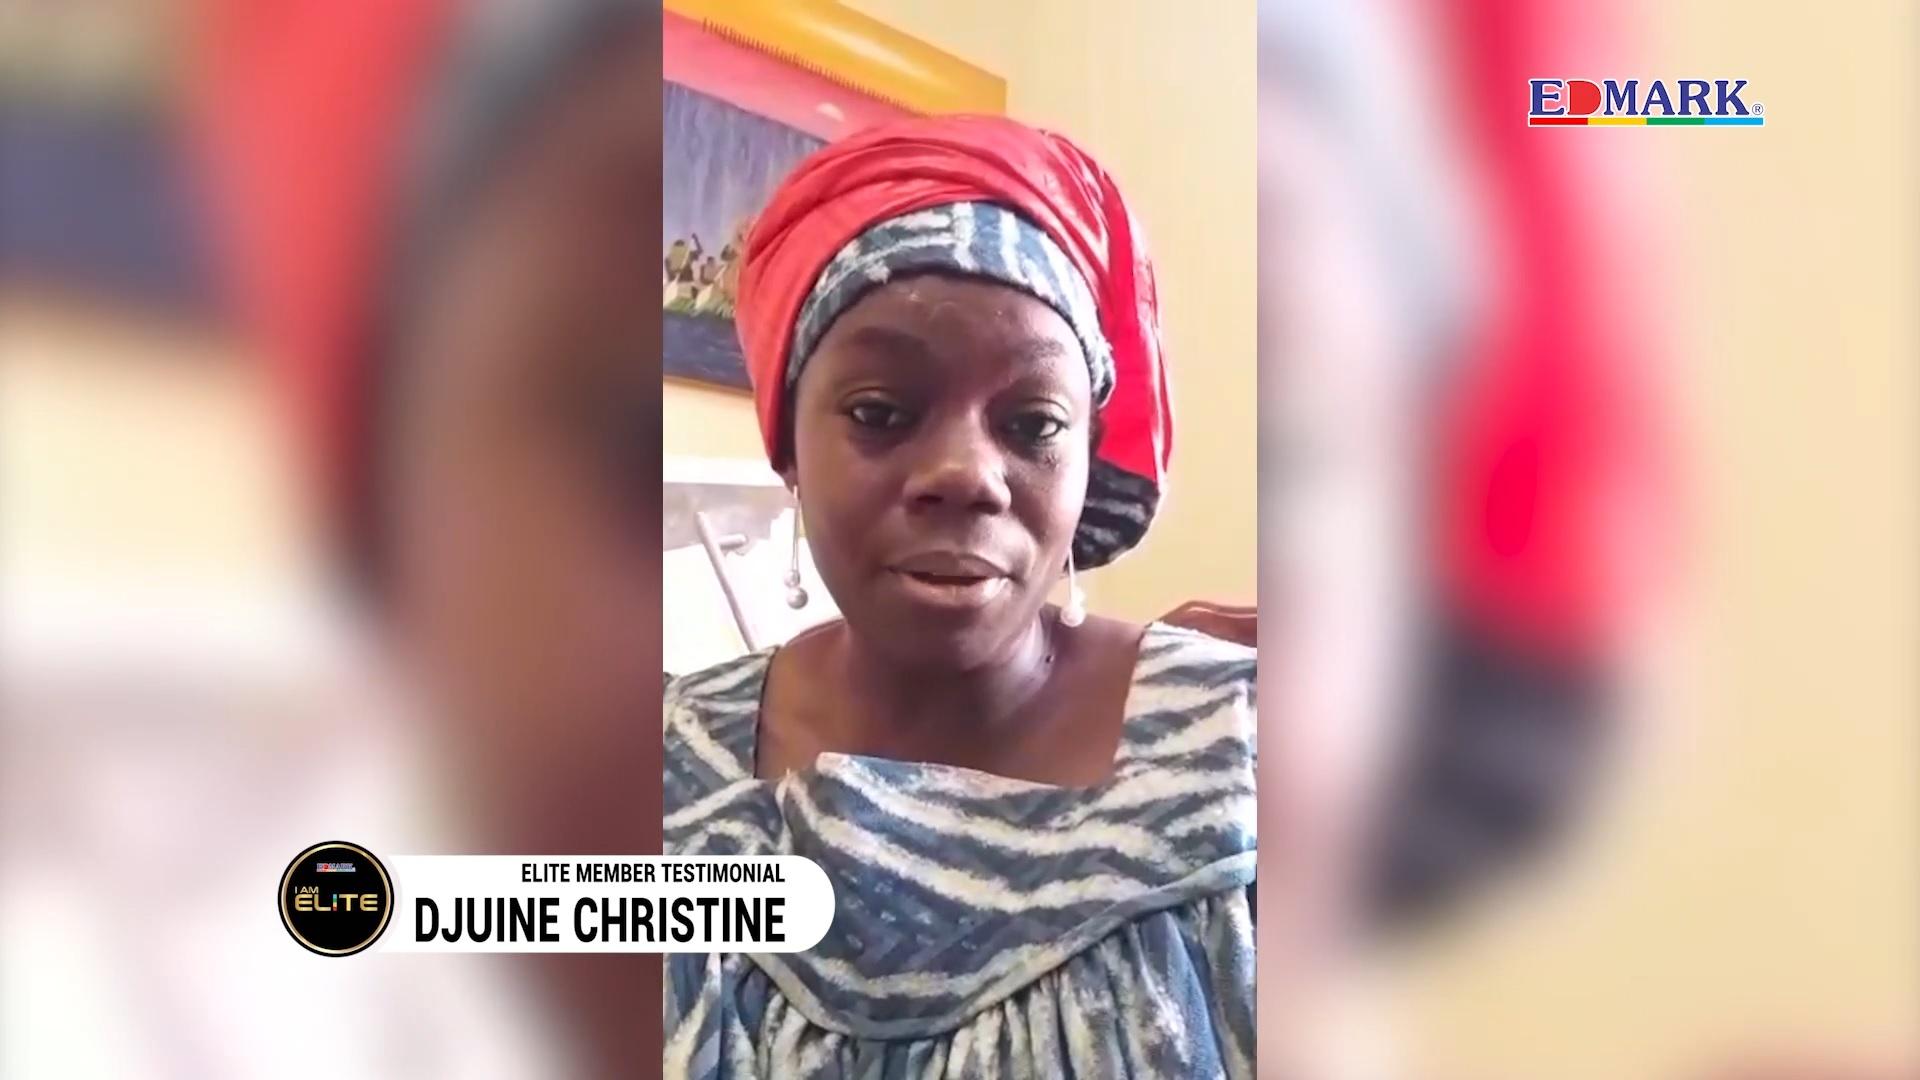 Elite Testimonial – Mgr Djuine Christine